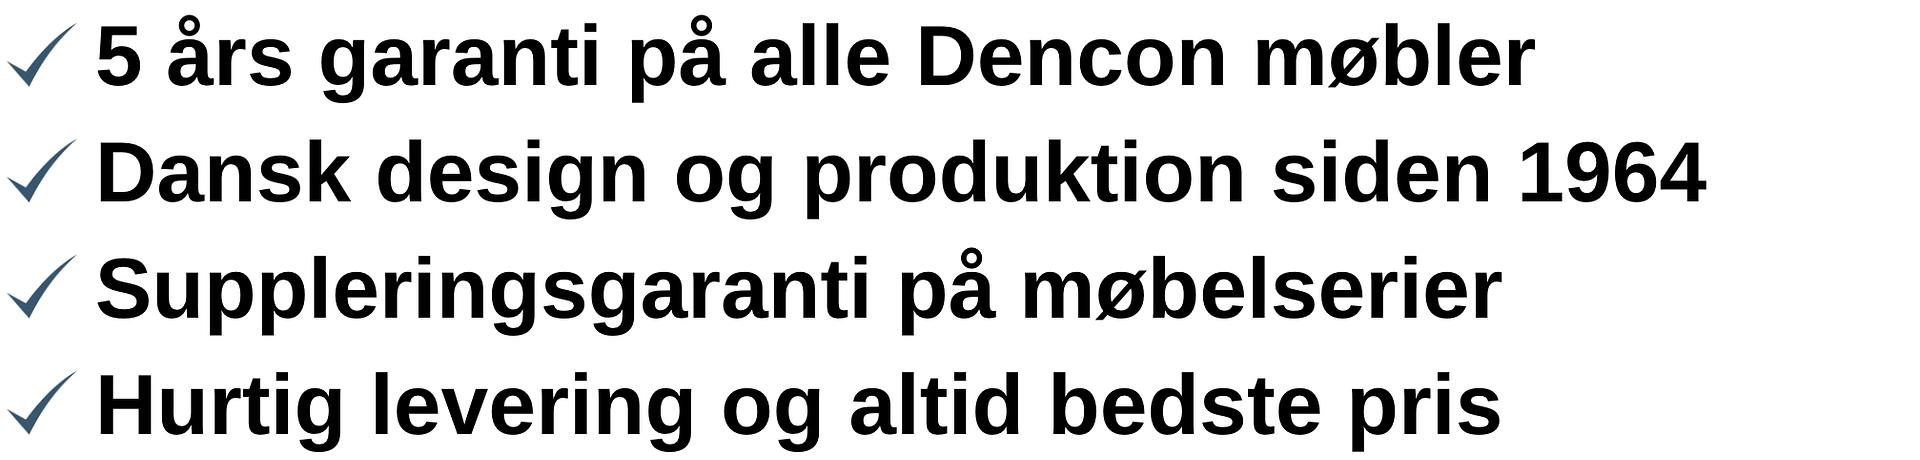 Dencon logotekst